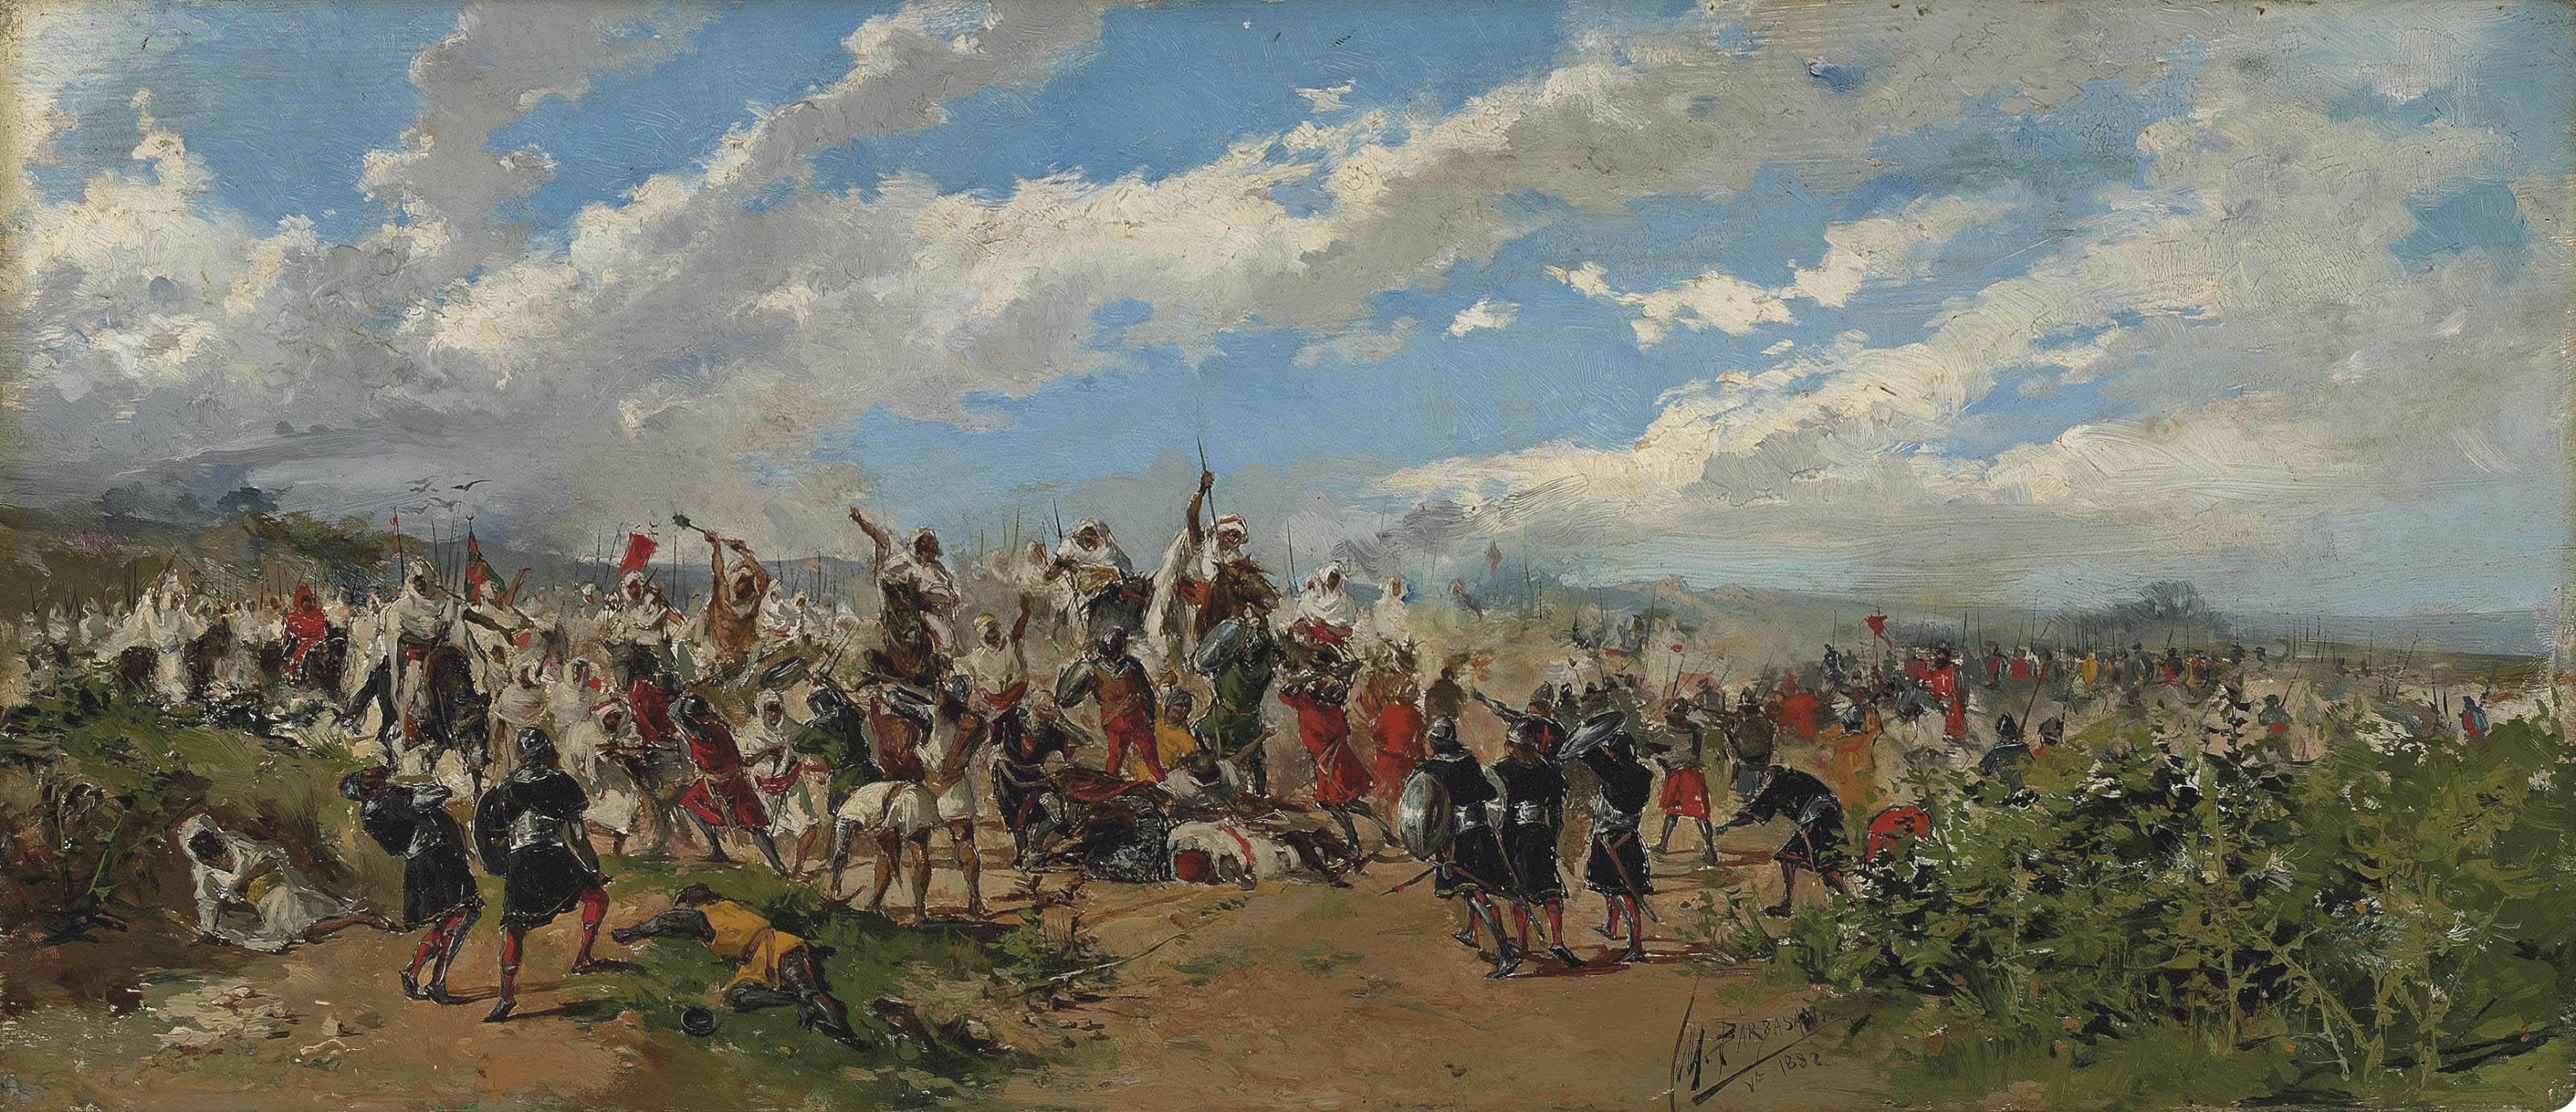 Battle of Guadalete, Spain (711-712 AD)